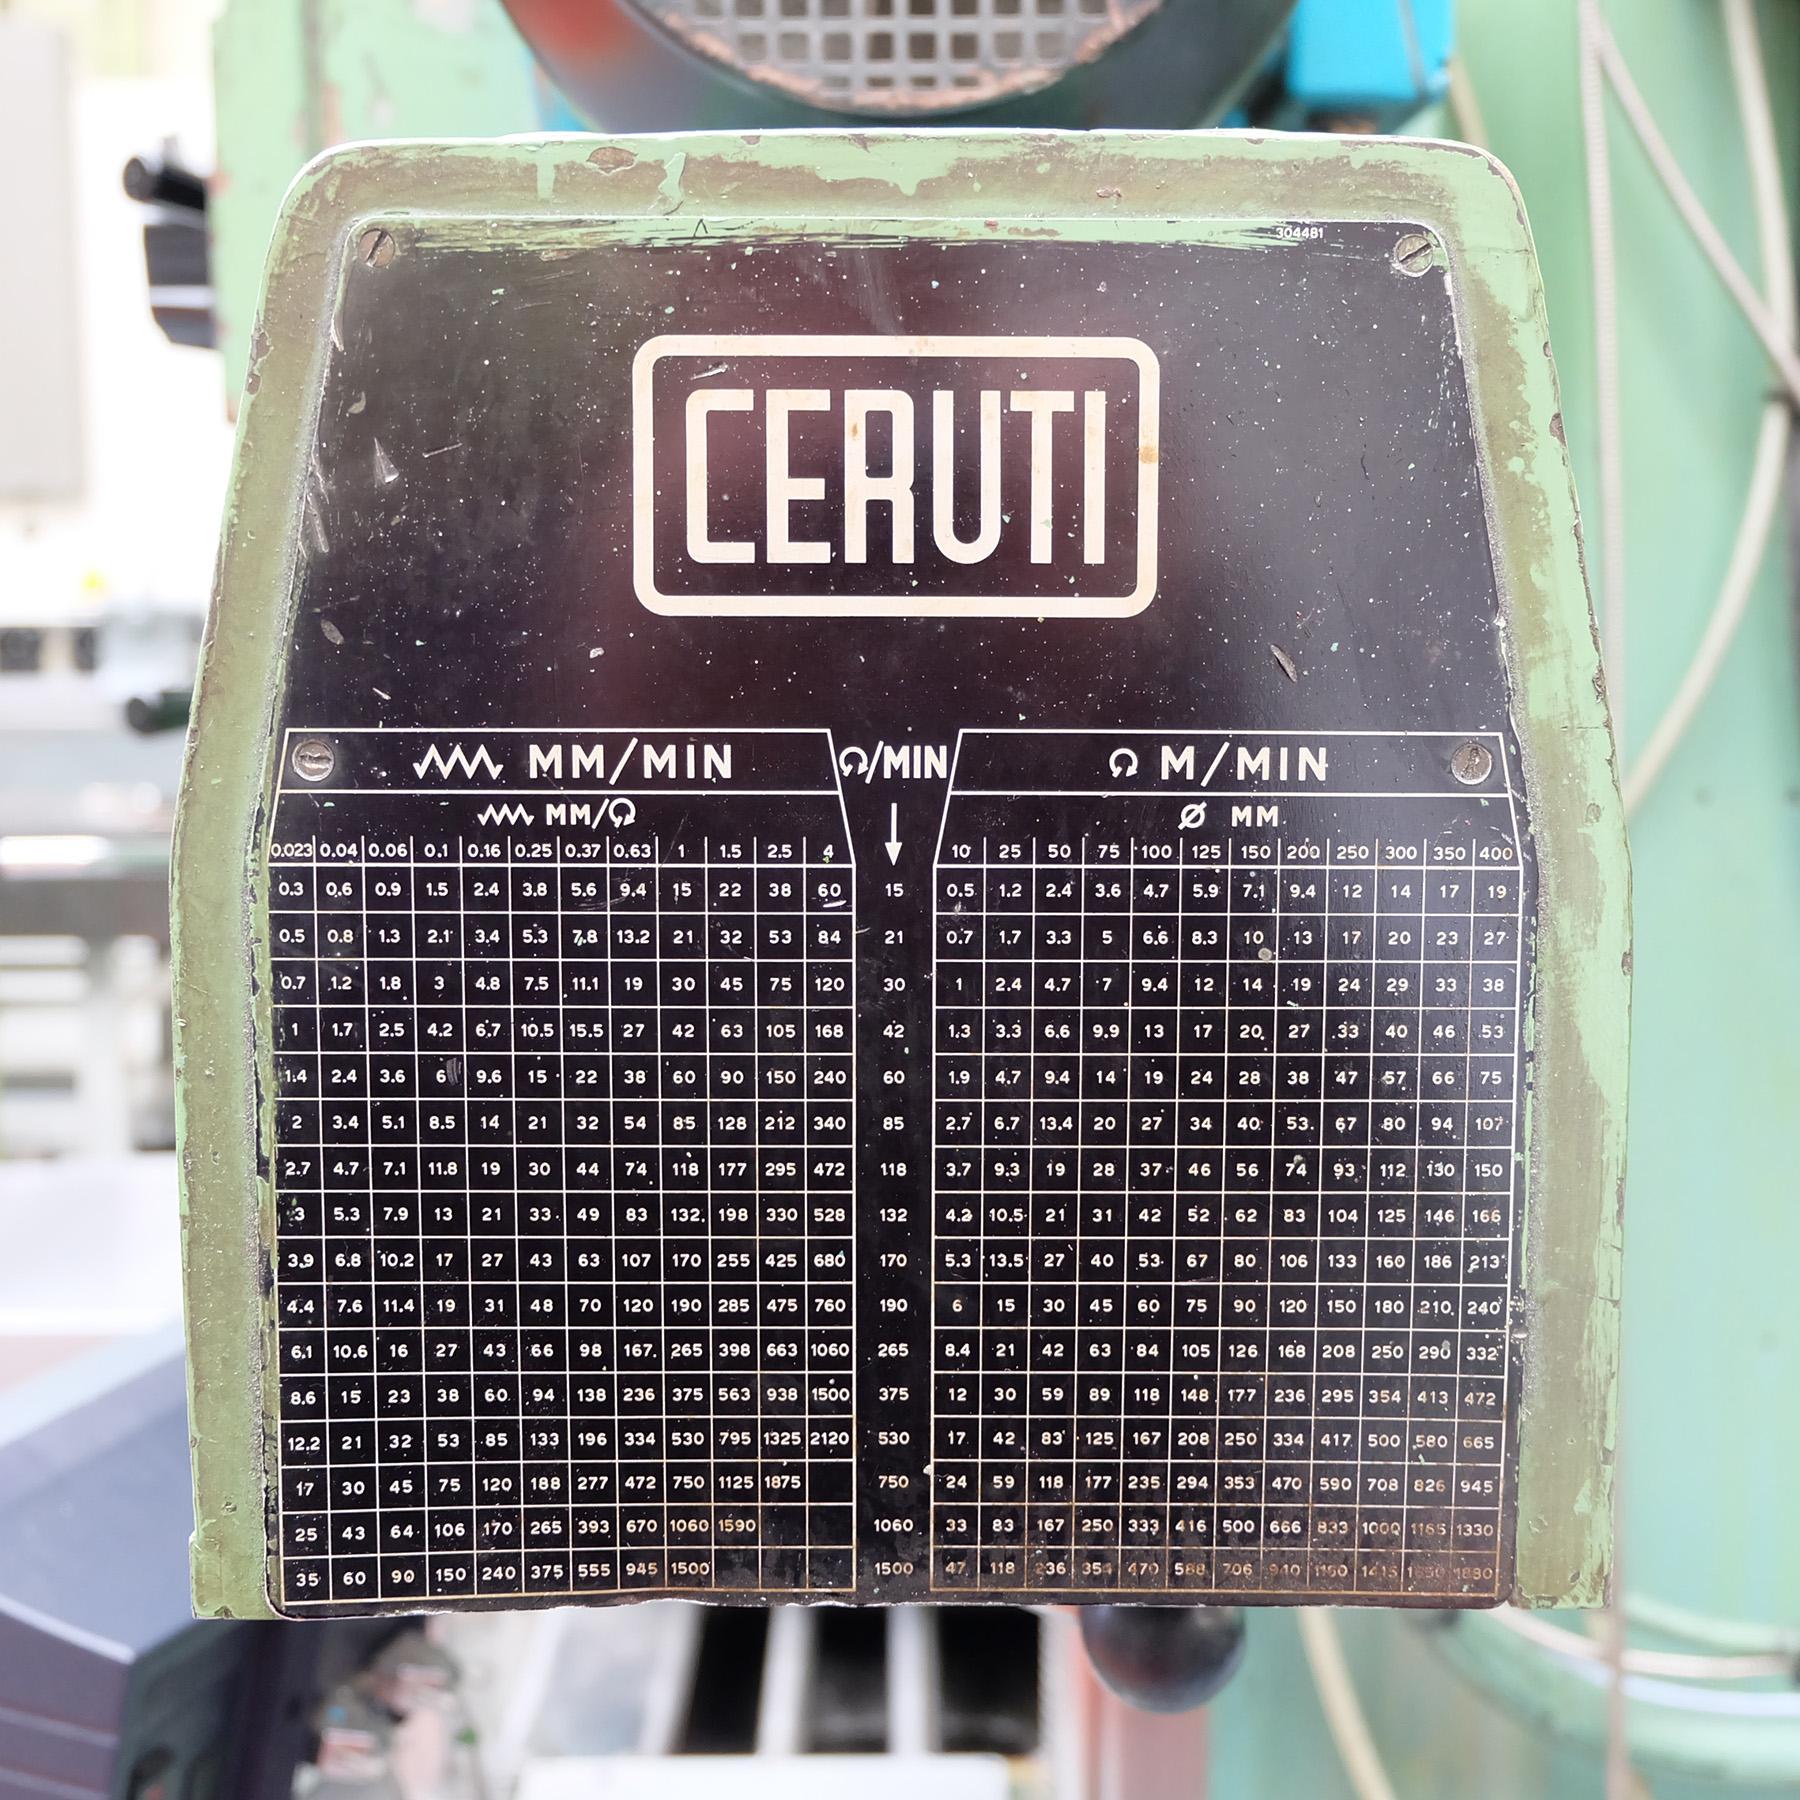 Ceruti Model ABC 75 Horizontal Boring & Milling Machine. With Tooling. - Image 13 of 15